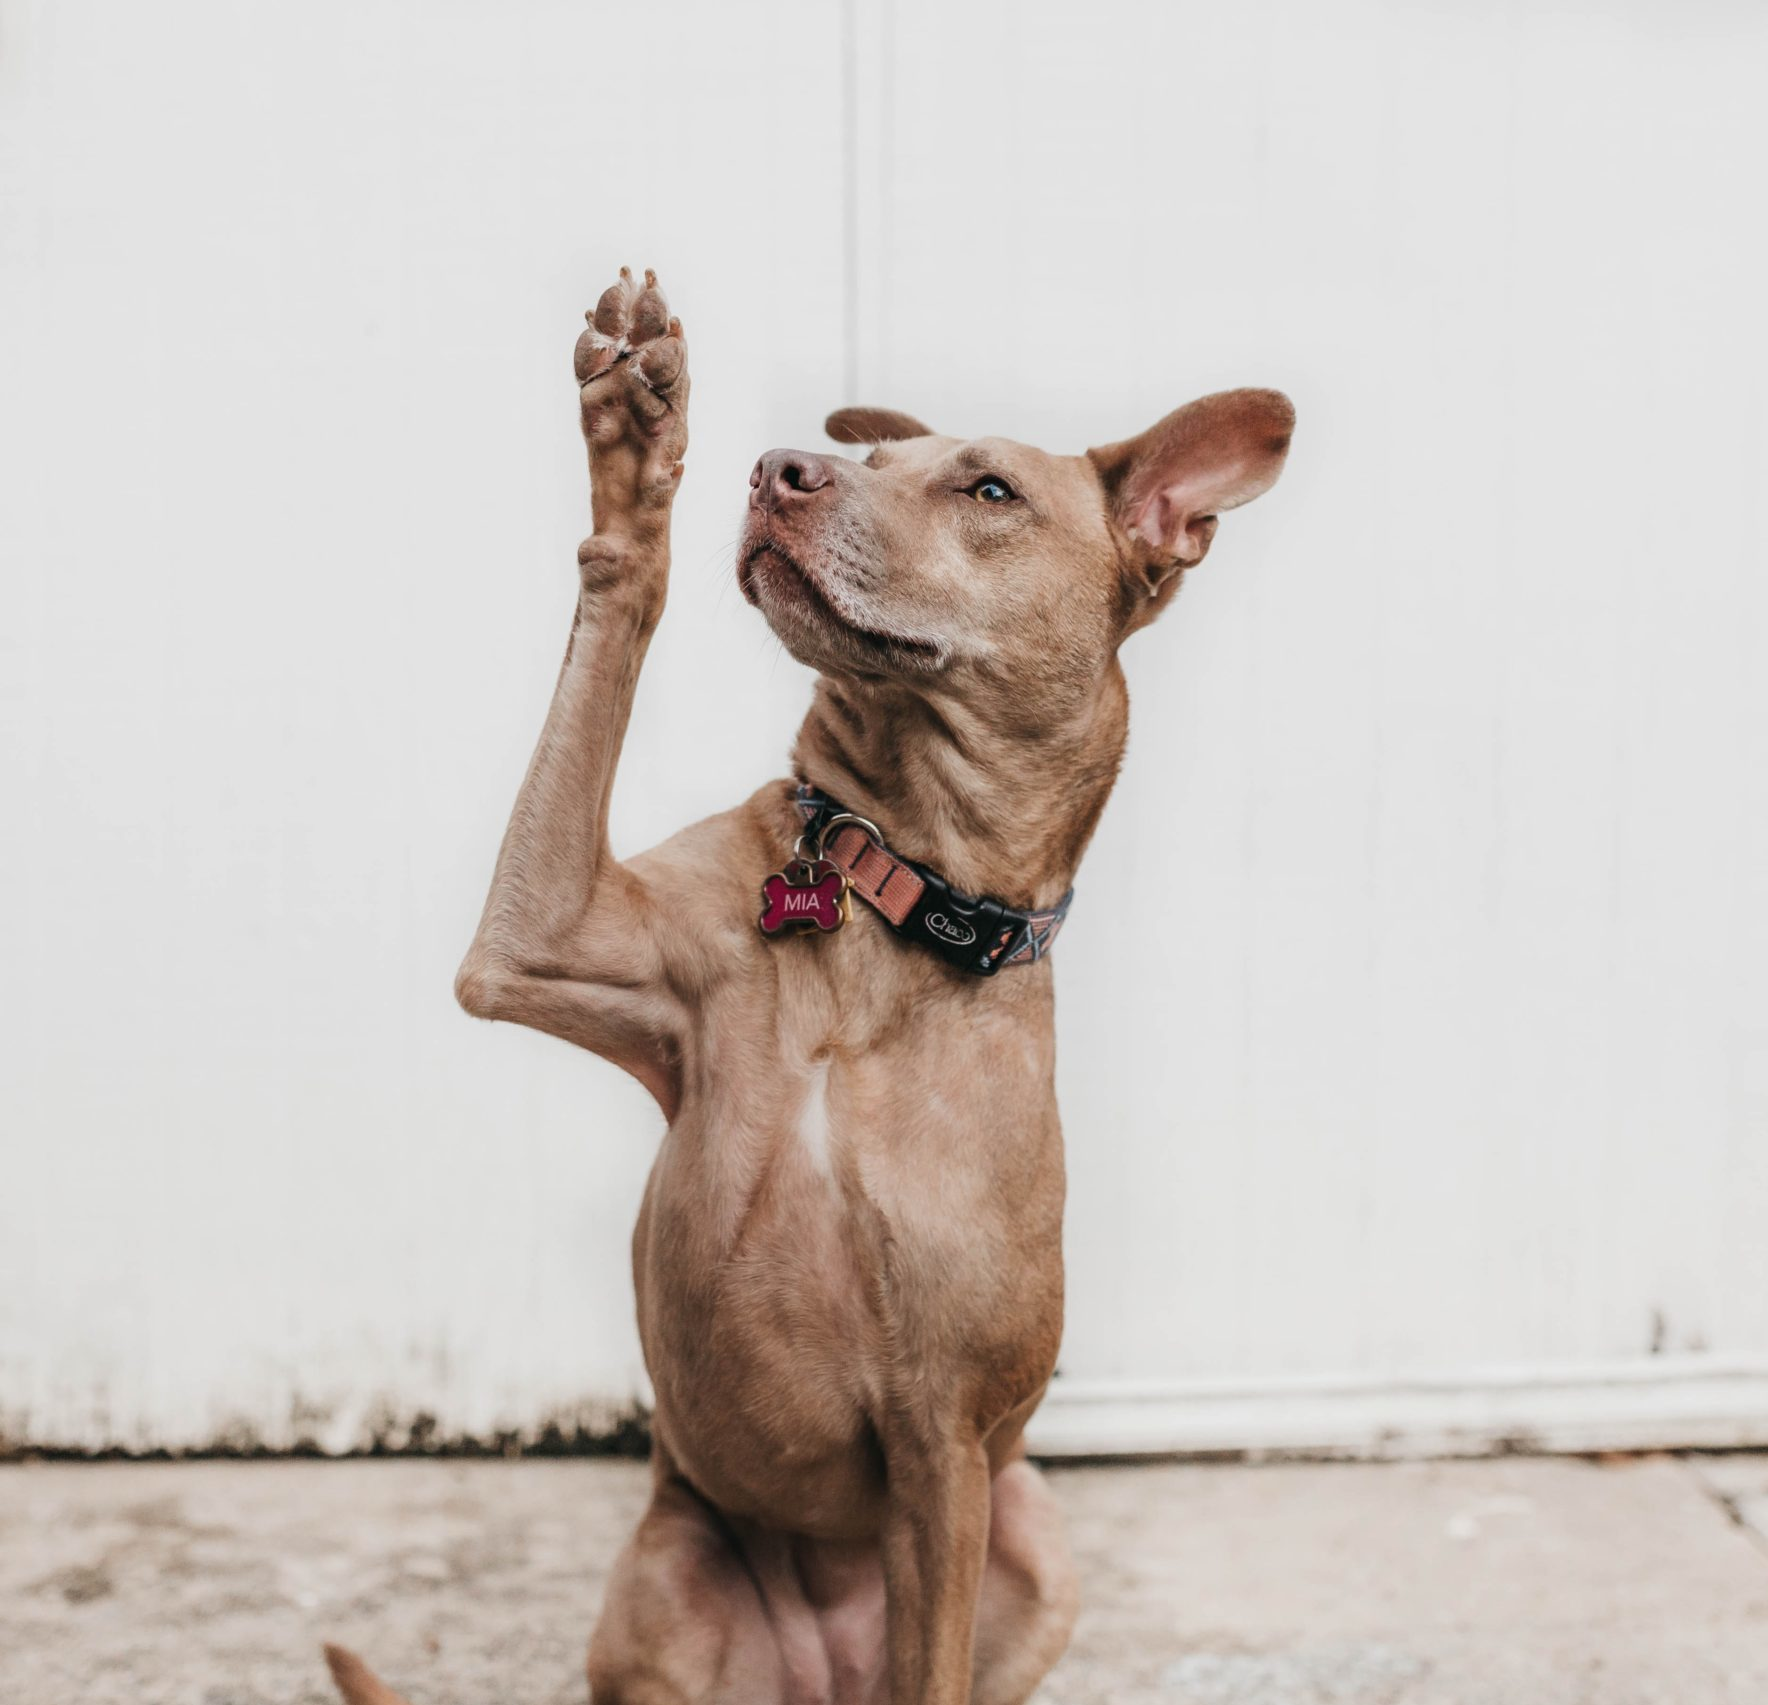 Dog raising right paw